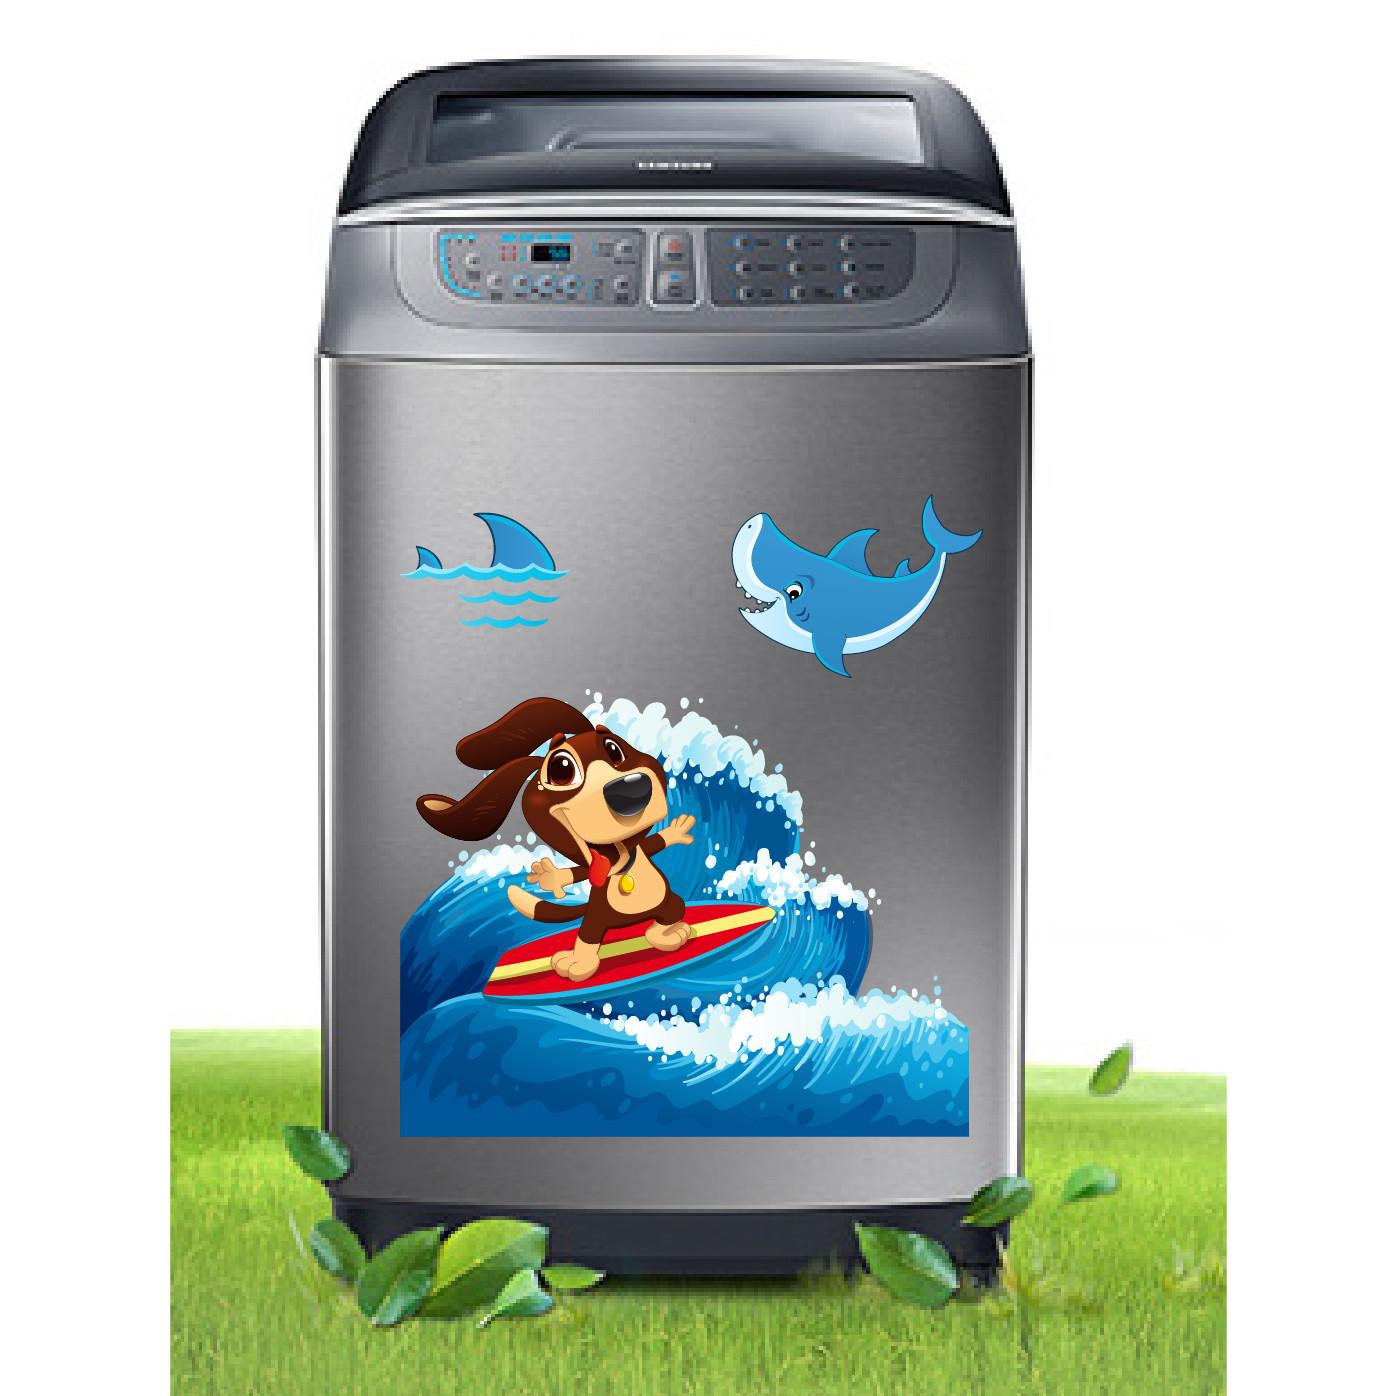 Decal trang trí máy giặt số 13